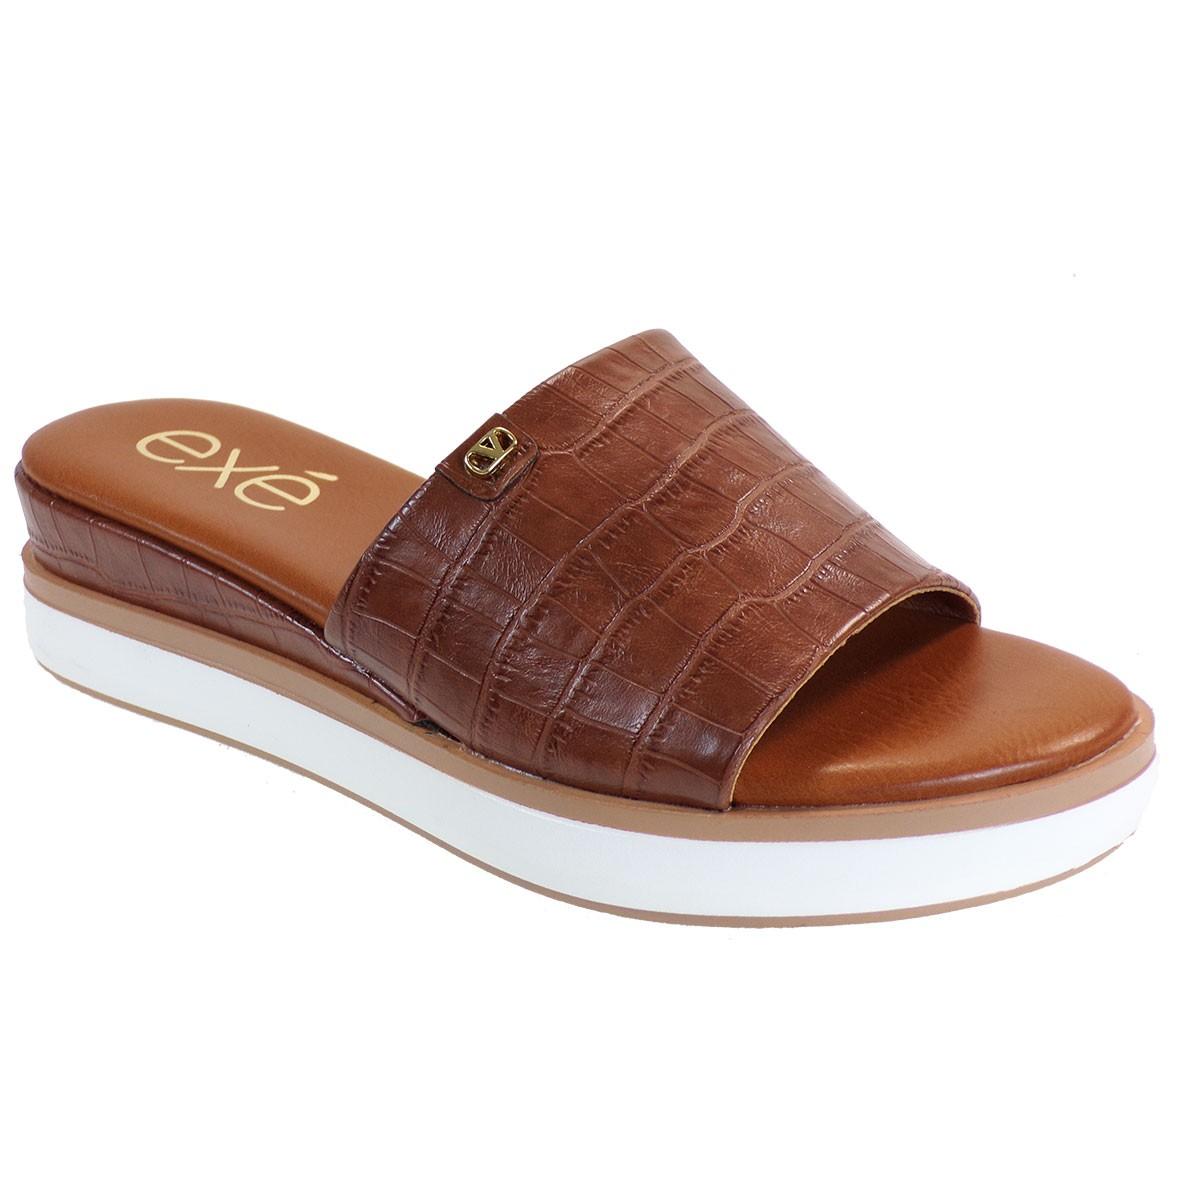 EXE Shoes Γυναικεία Παντόφλας Πλατφόρμες AMANDA-380 Ταμπά Κροκό M47003802G55